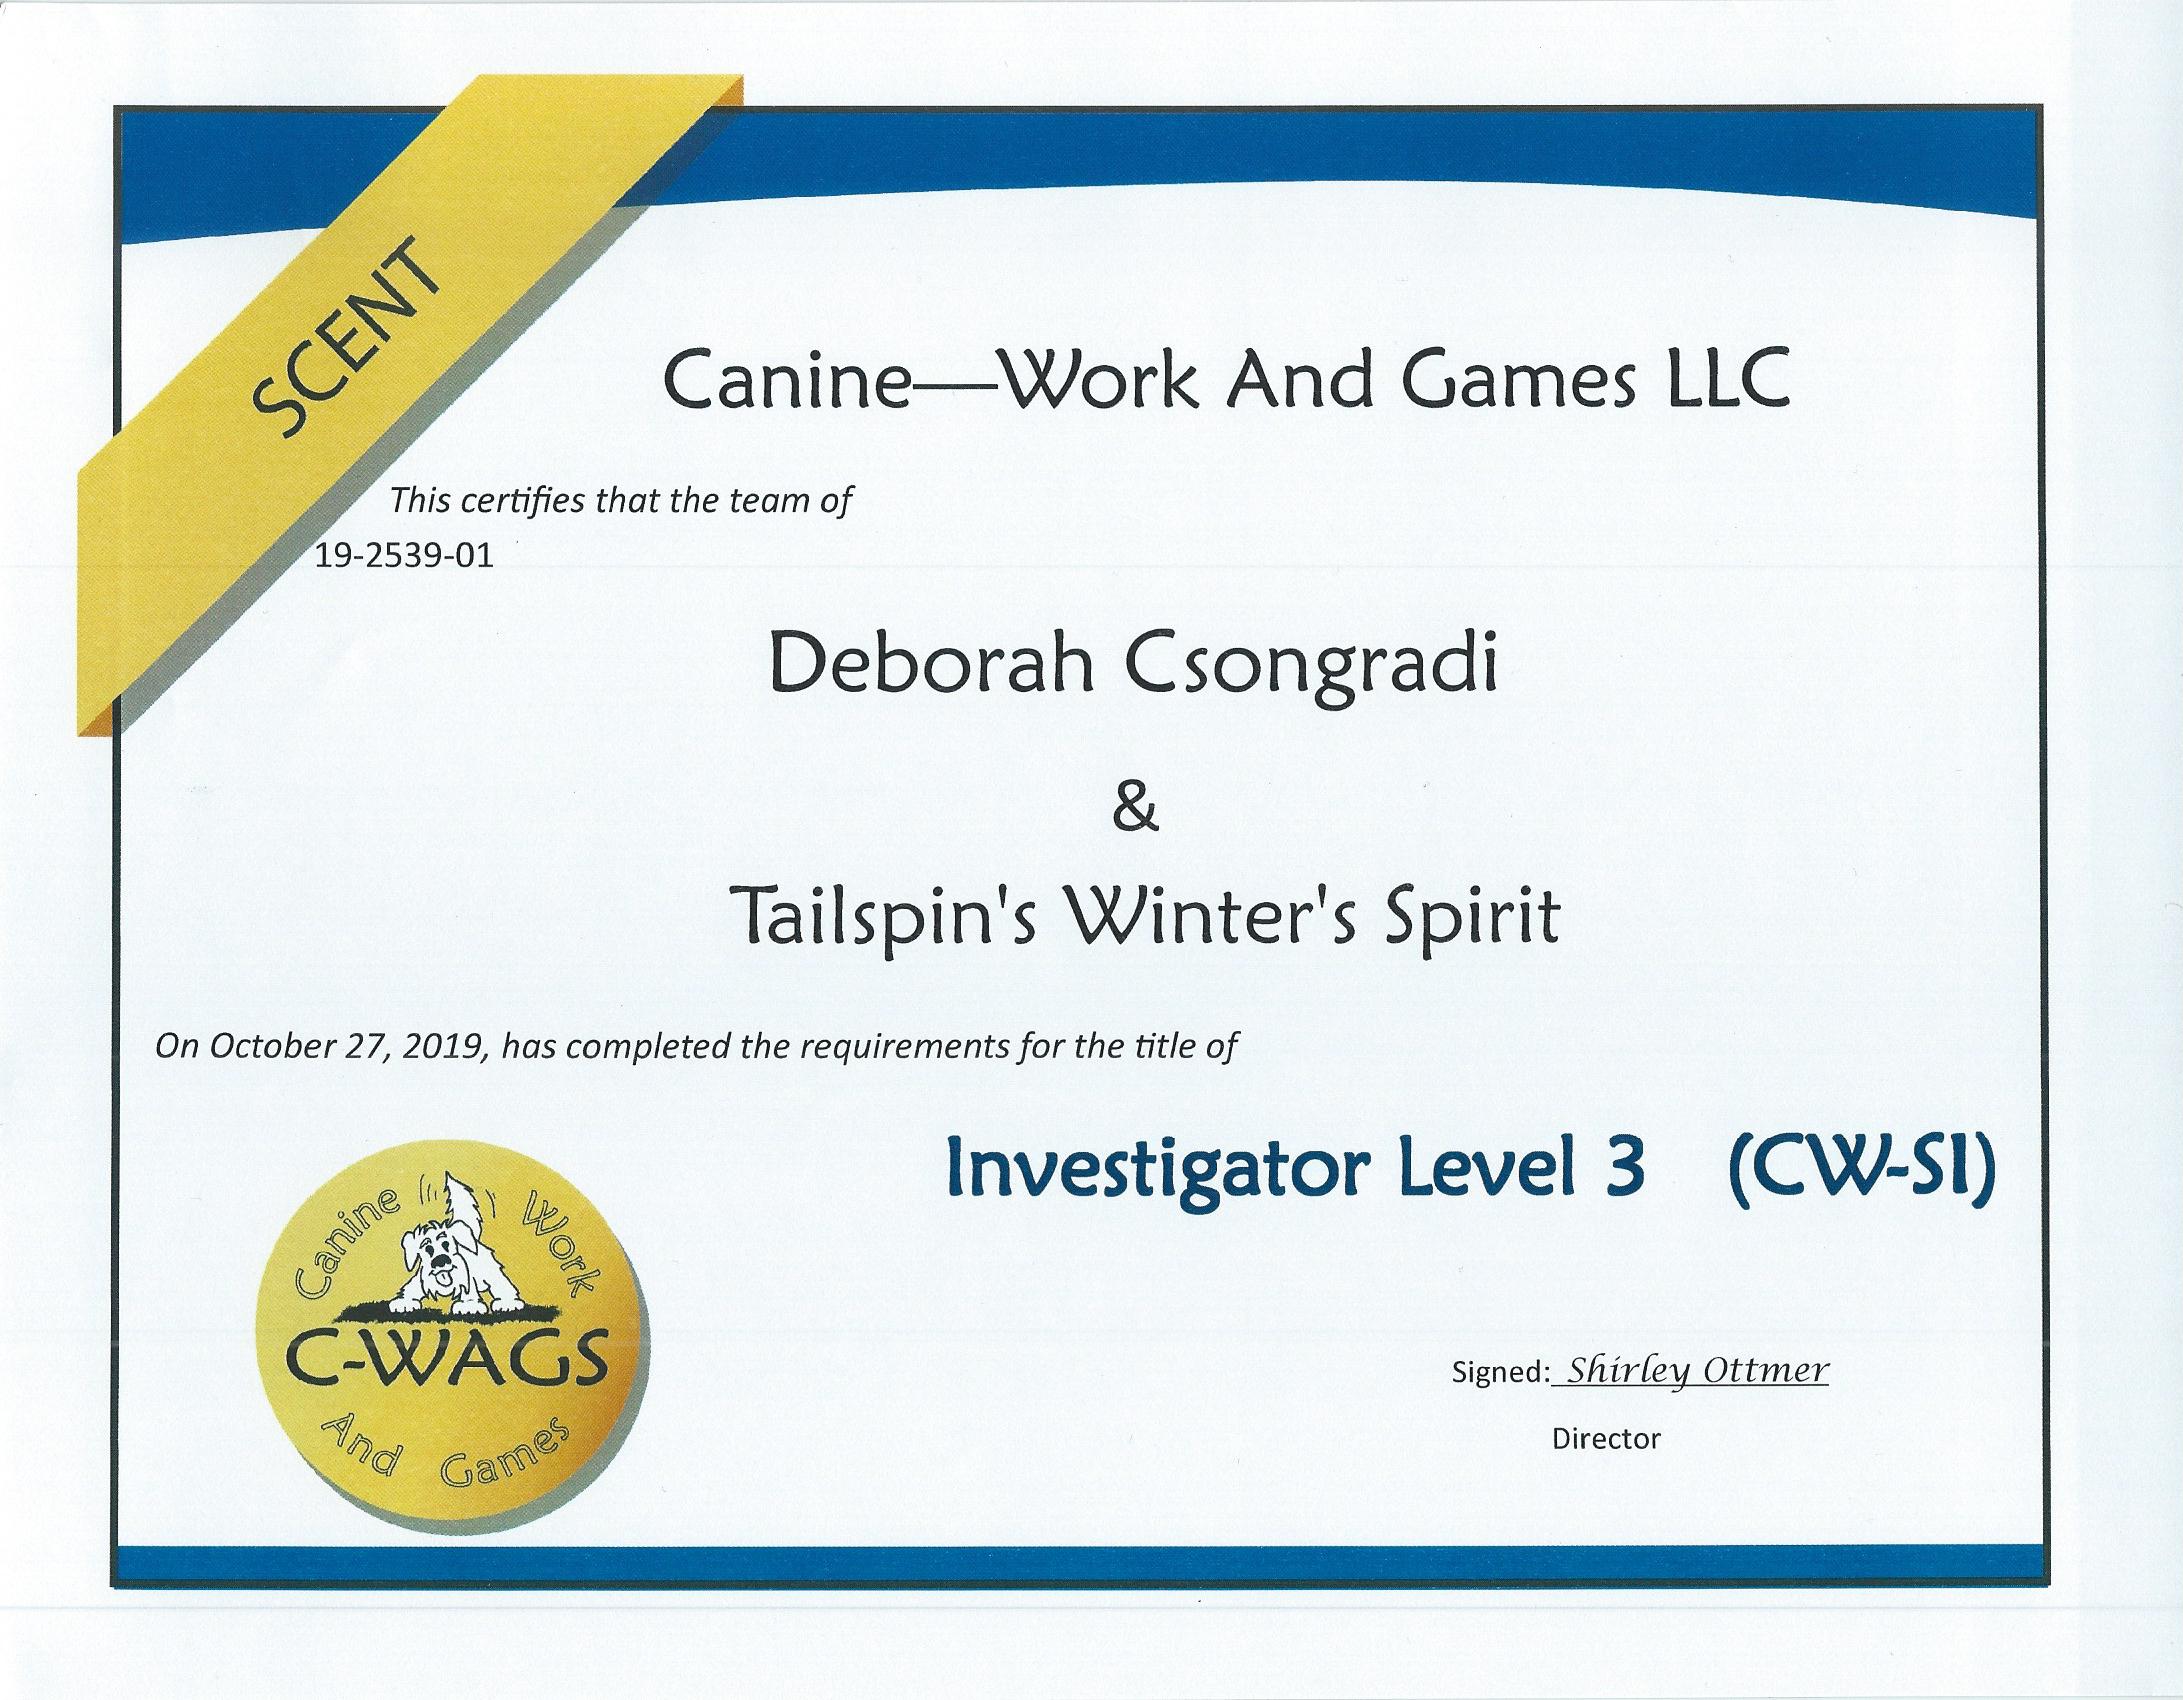 SpiritCWAGS-CW-SI